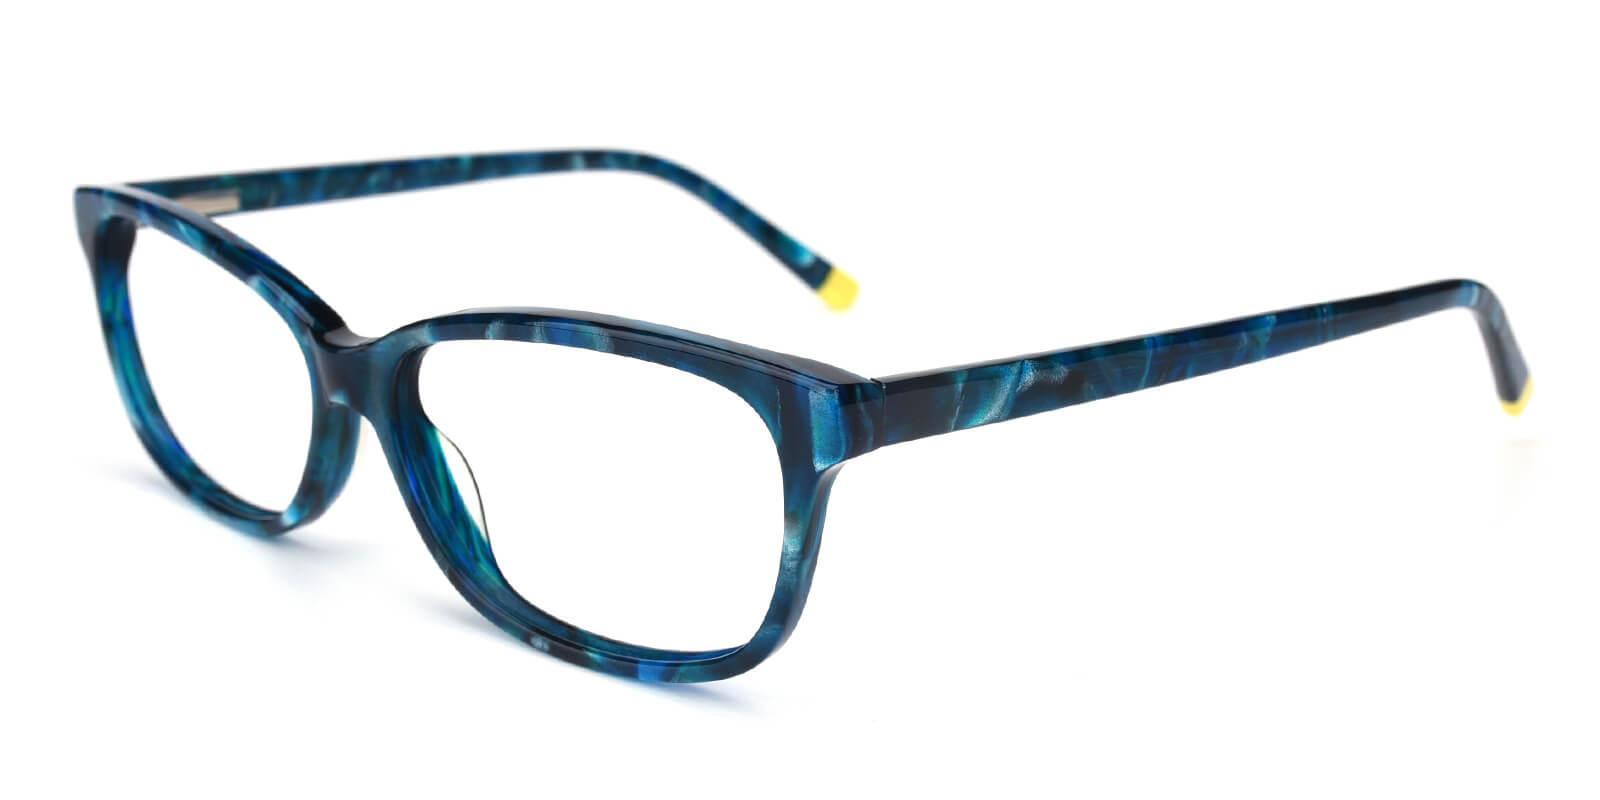 Zion-Blue-Cat-Acetate-Eyeglasses-additional1